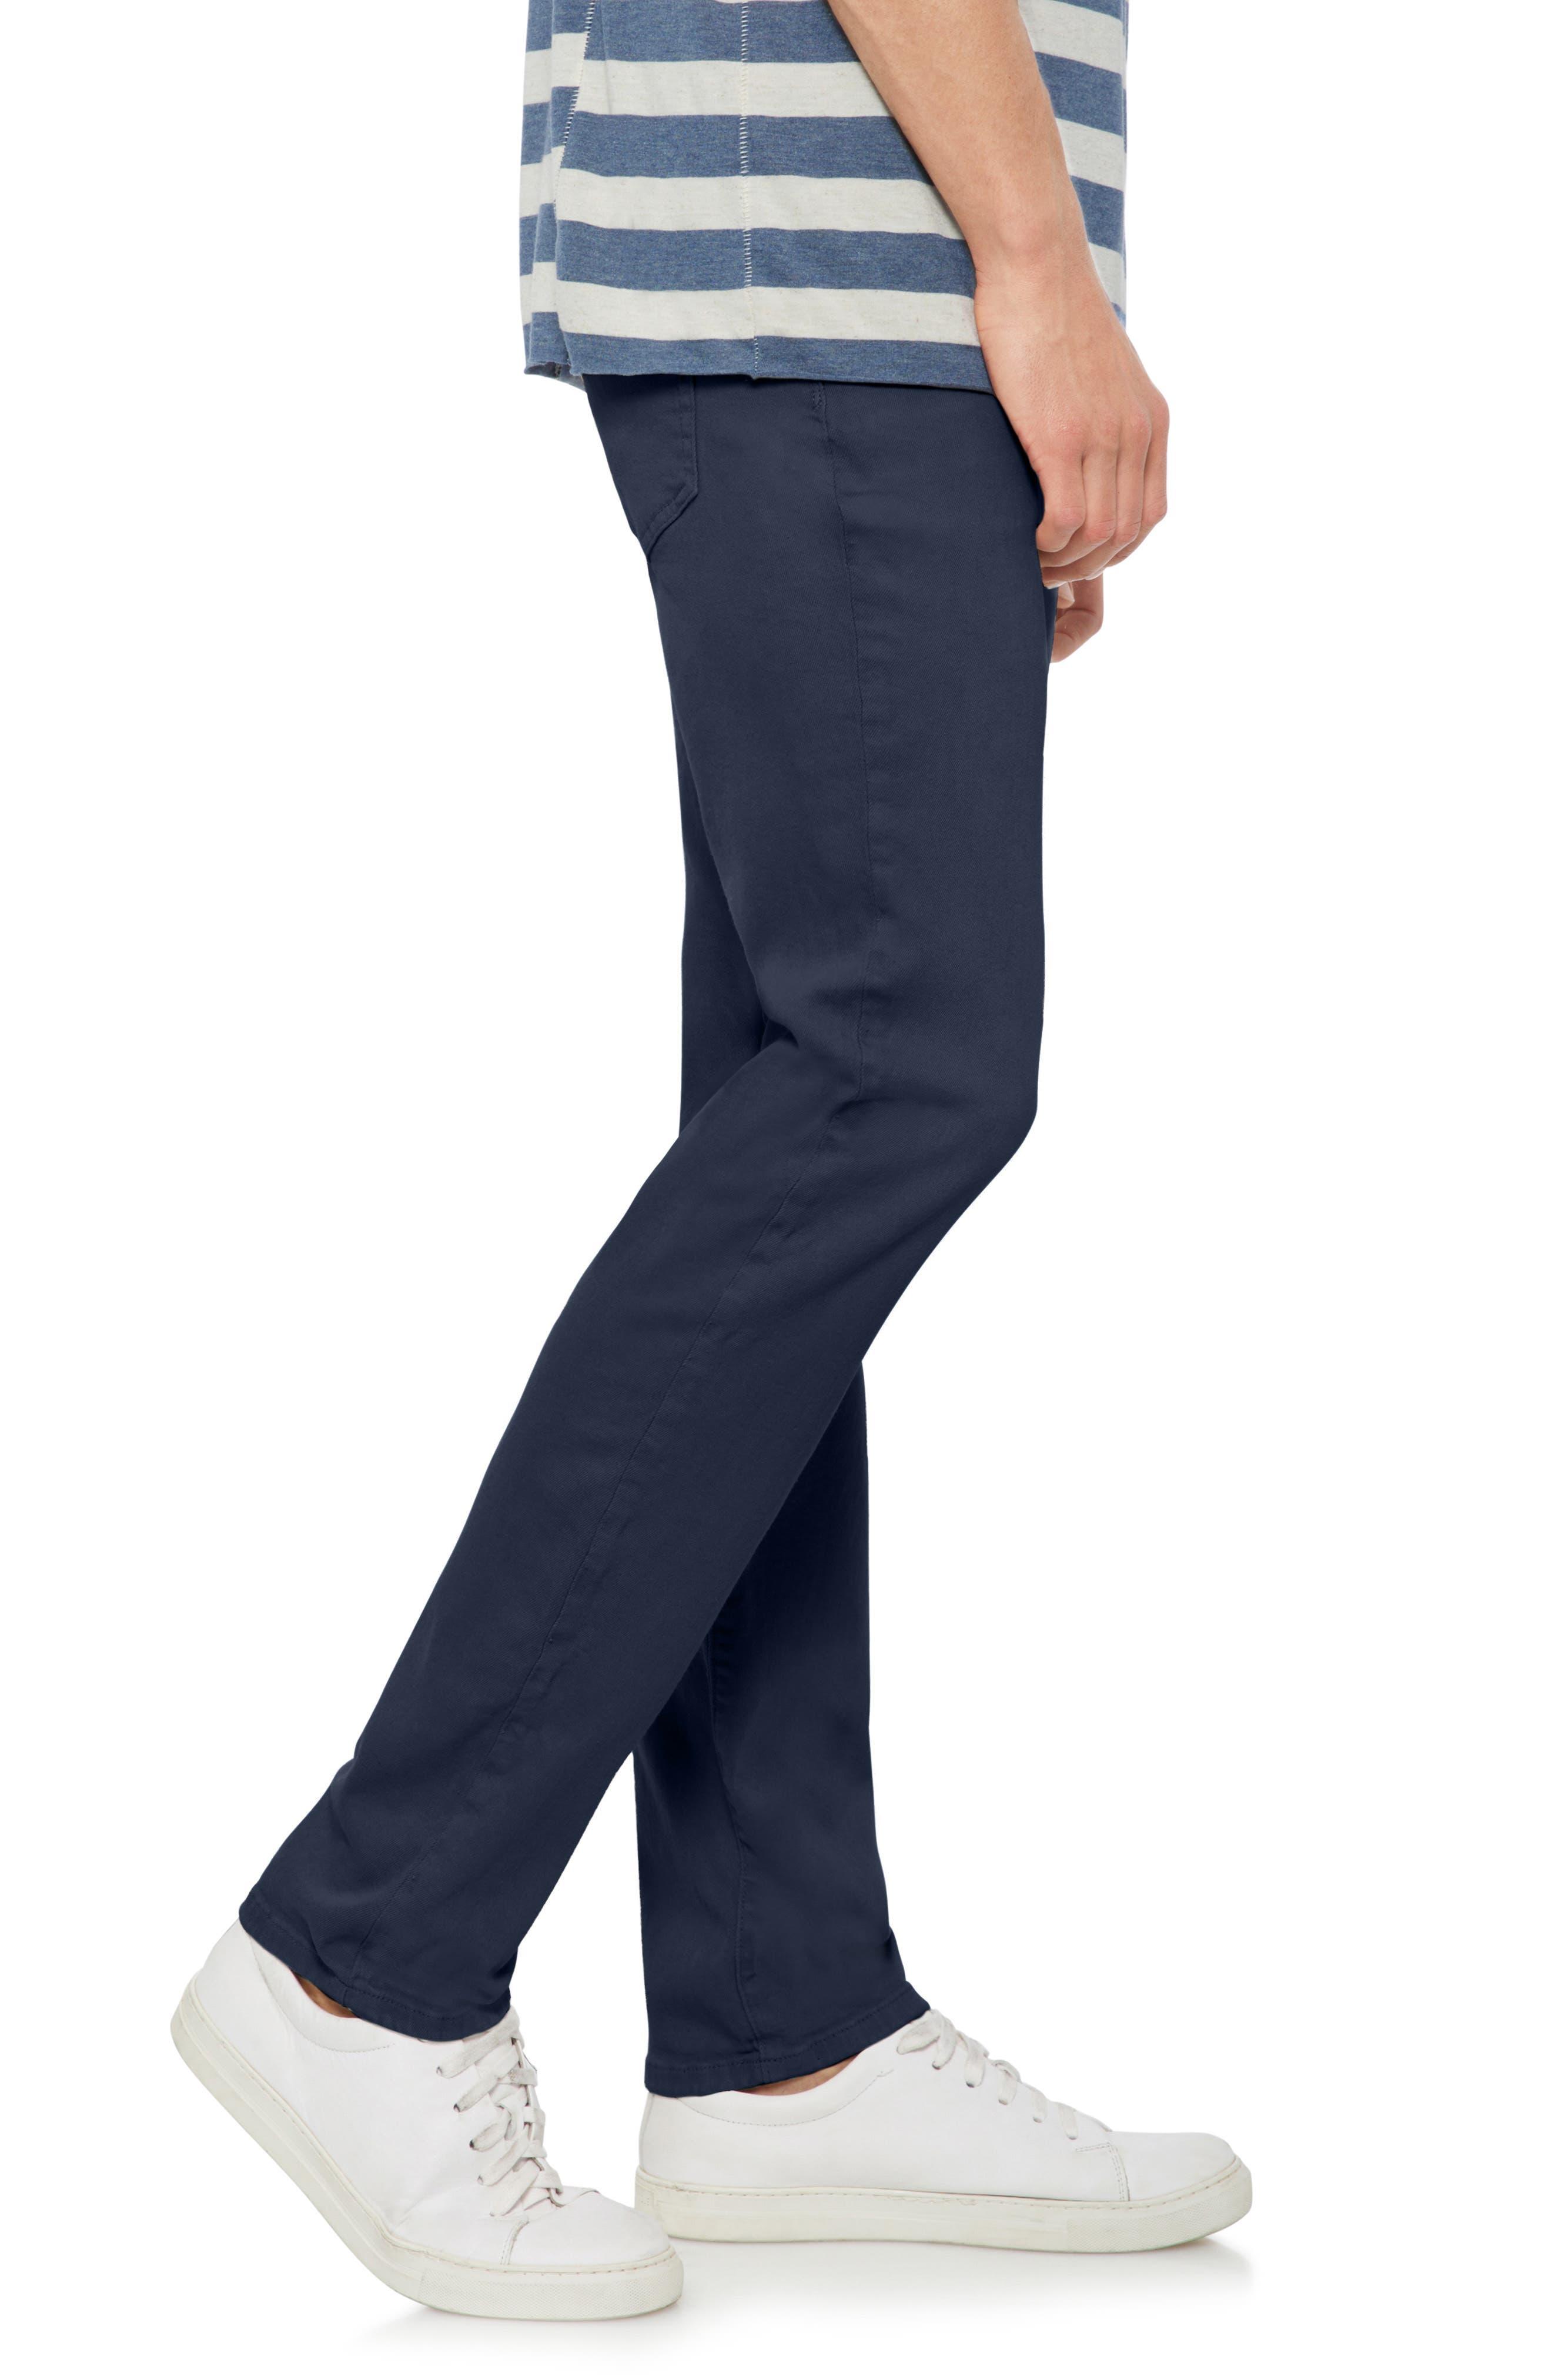 Brixton Slim Straight Fit Pants,                             Alternate thumbnail 3, color,                             NAVY